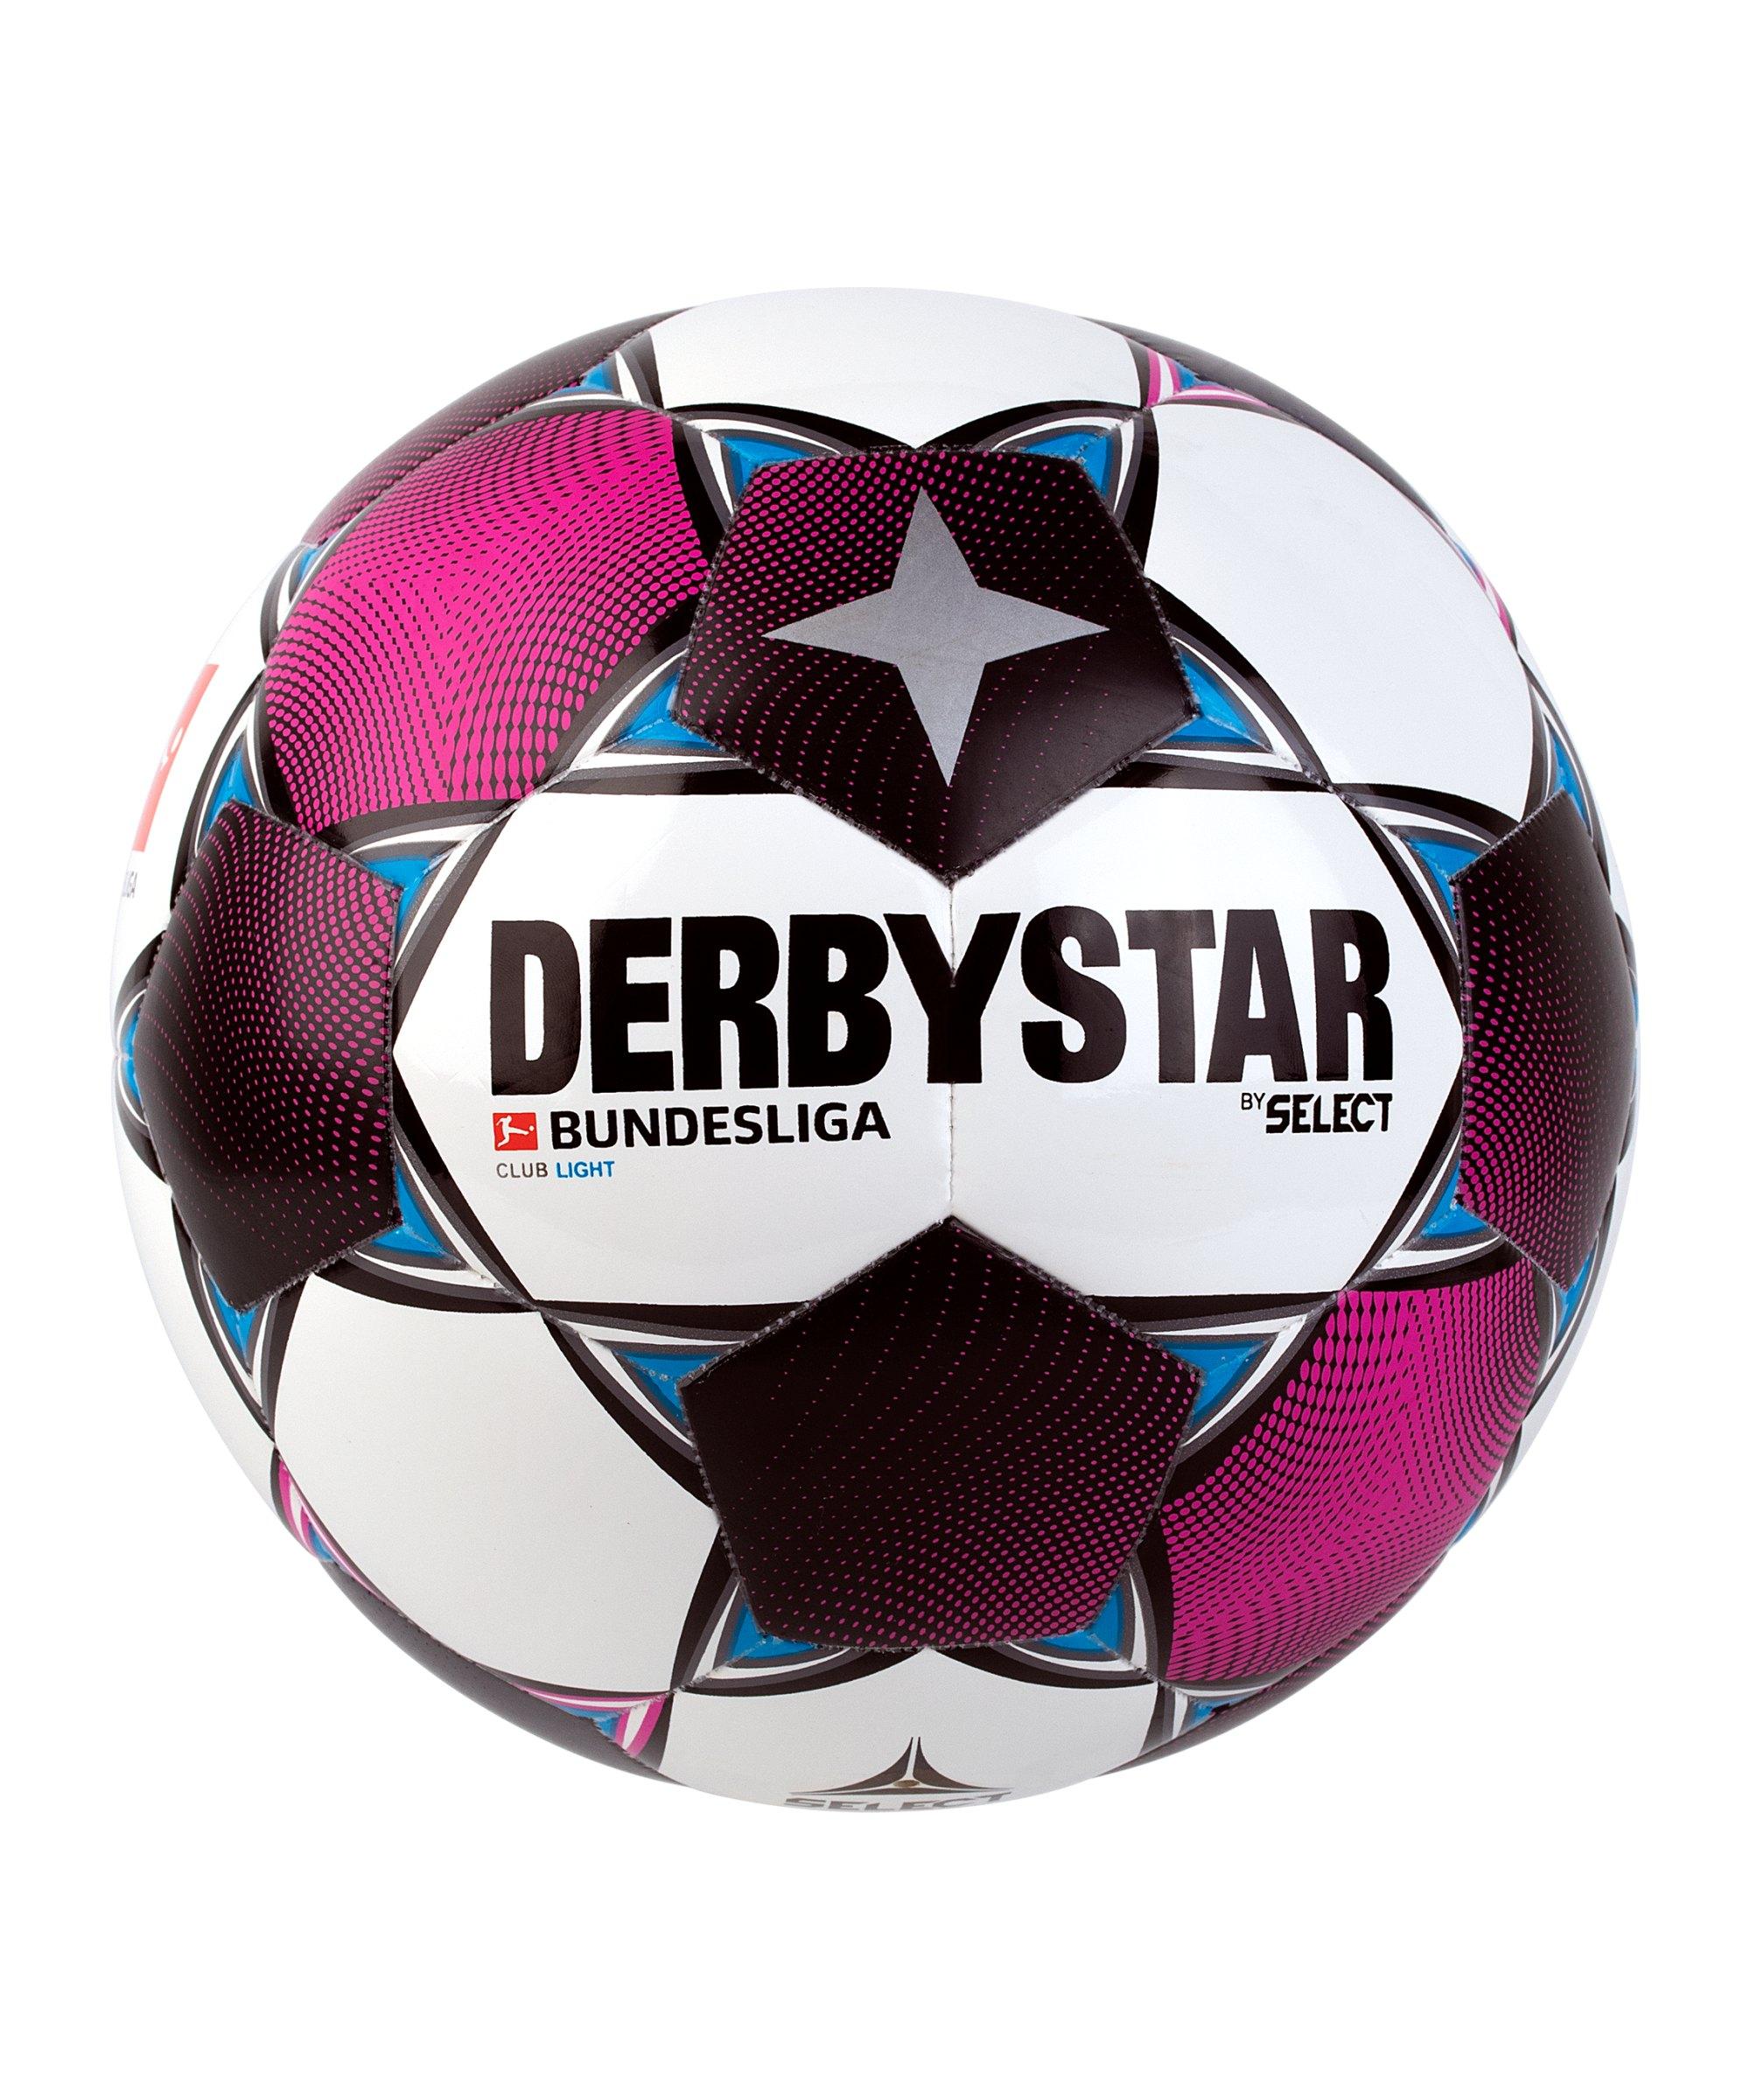 Derbystar Bundesliga Club Light Trainingsball Weiss F020 - weiss